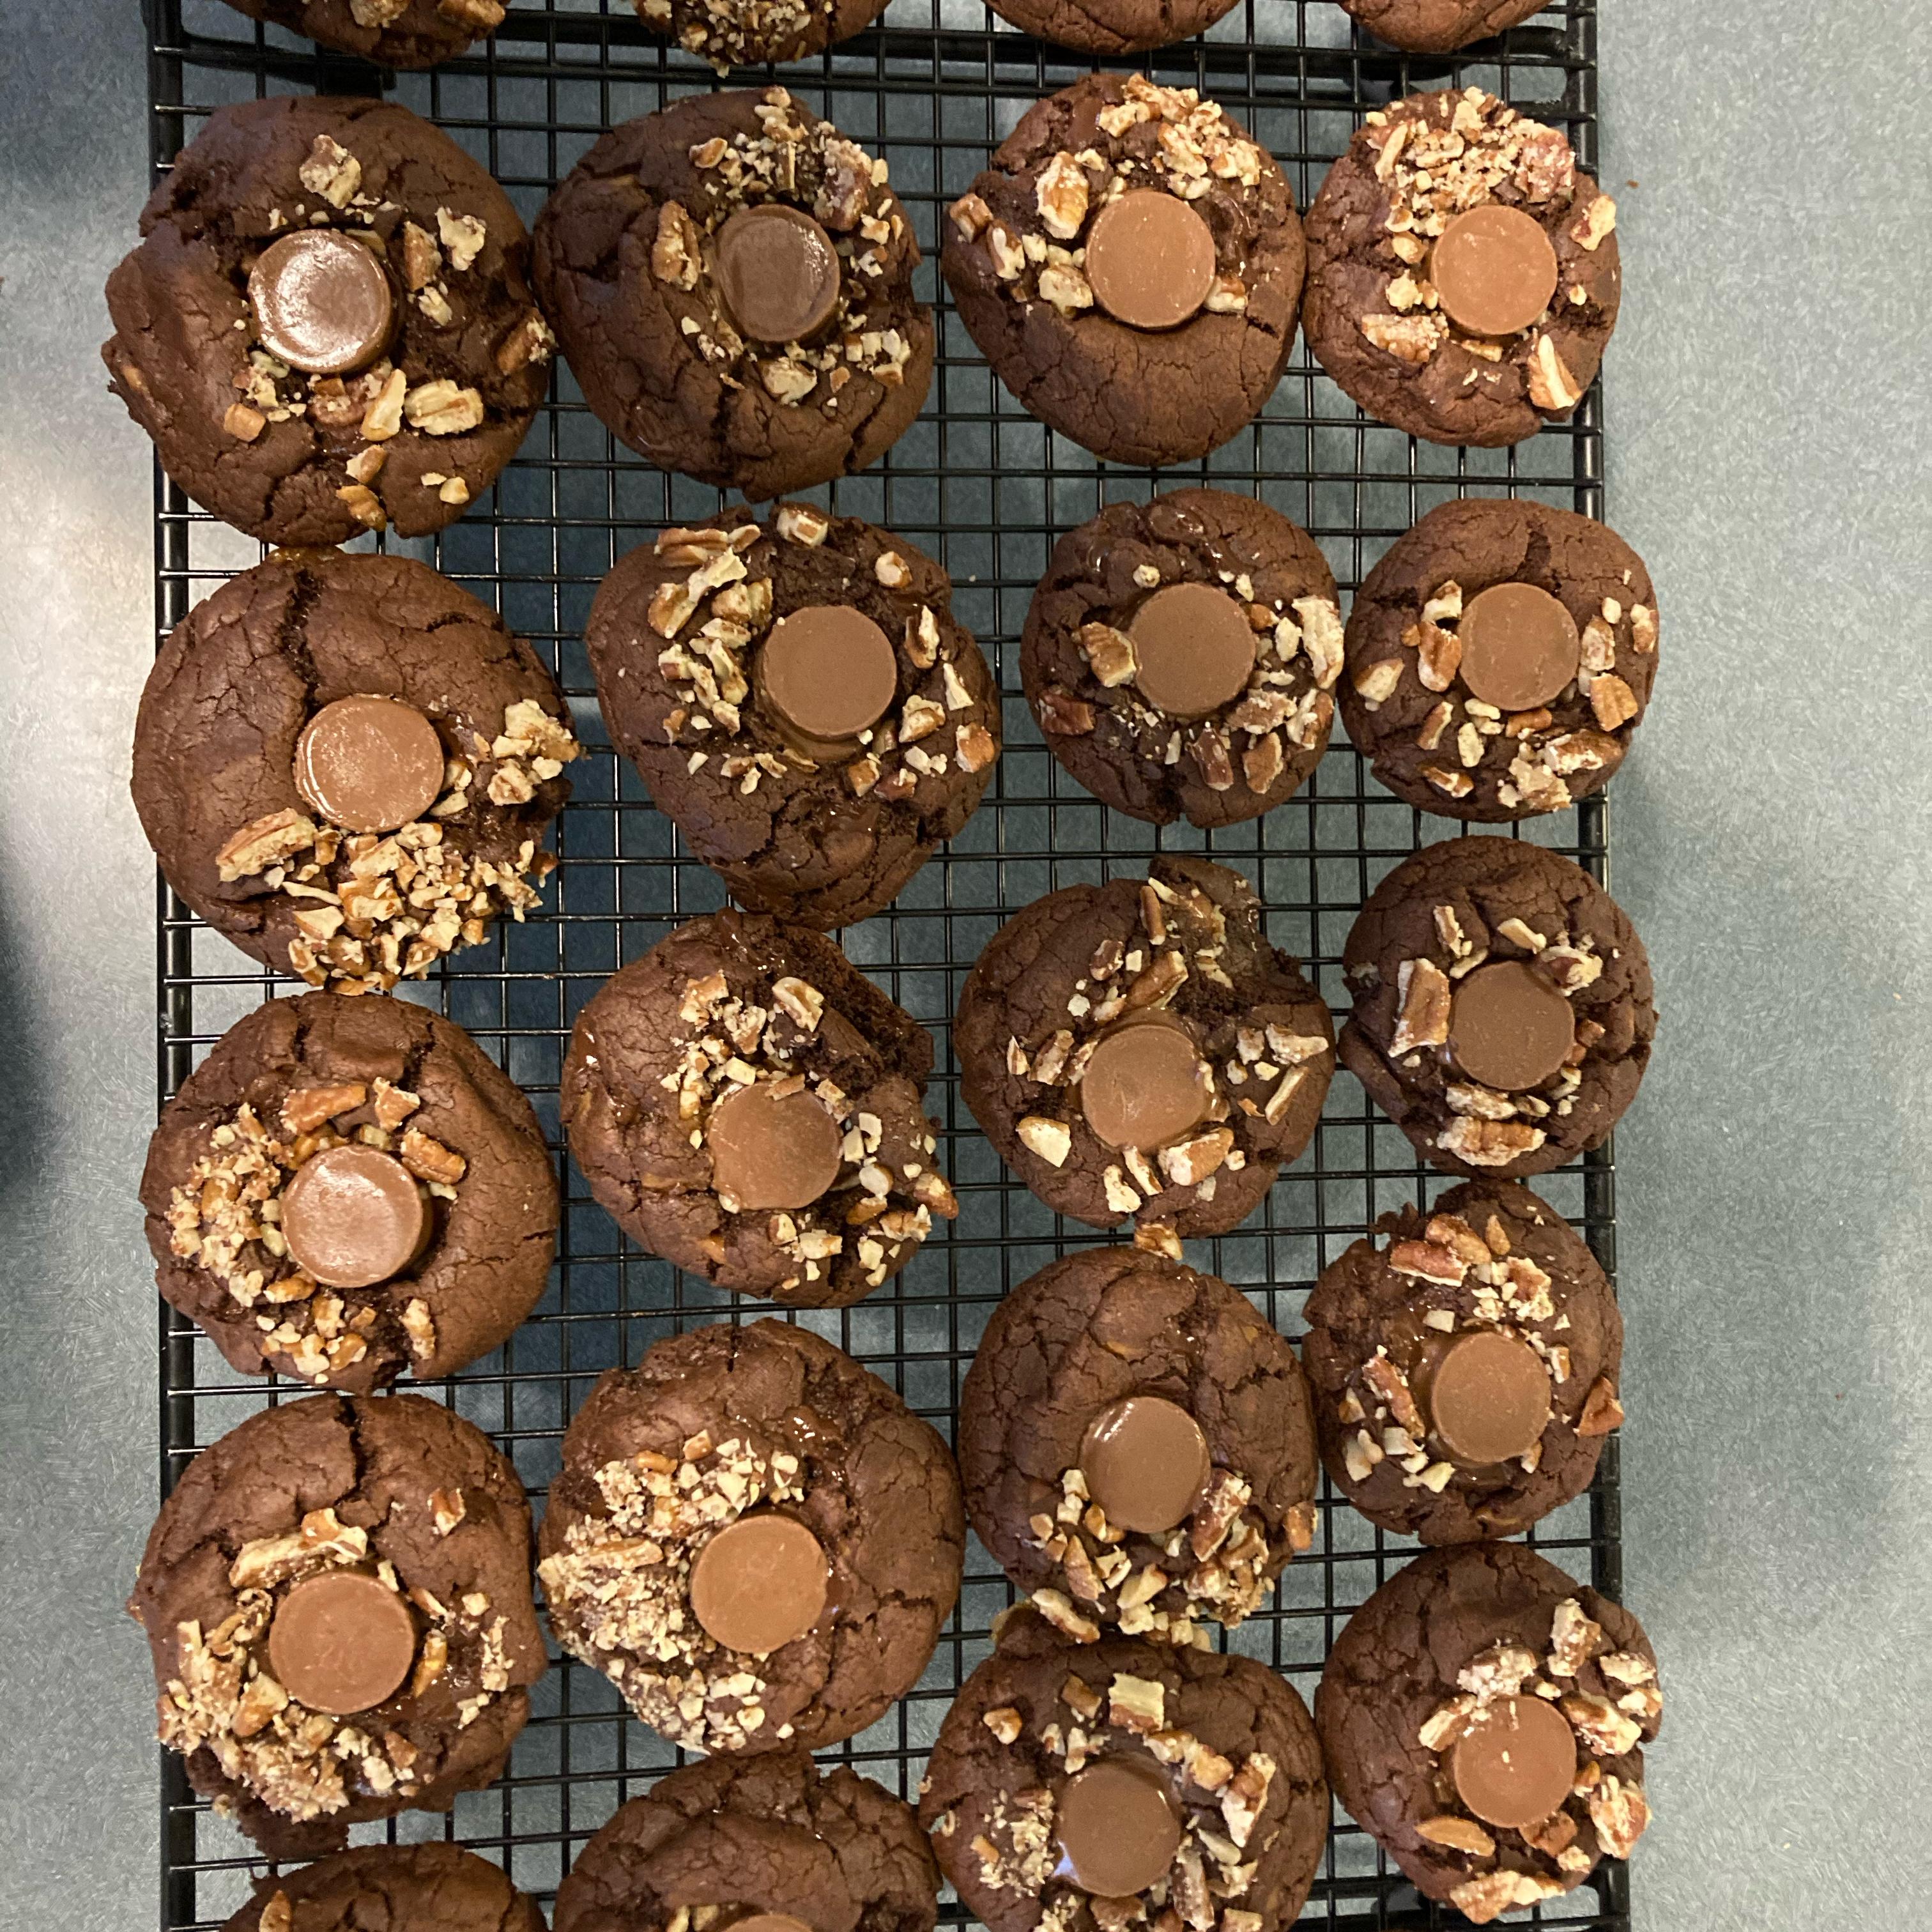 Turtles® Fudge Chocolate Chip Cookies Mark